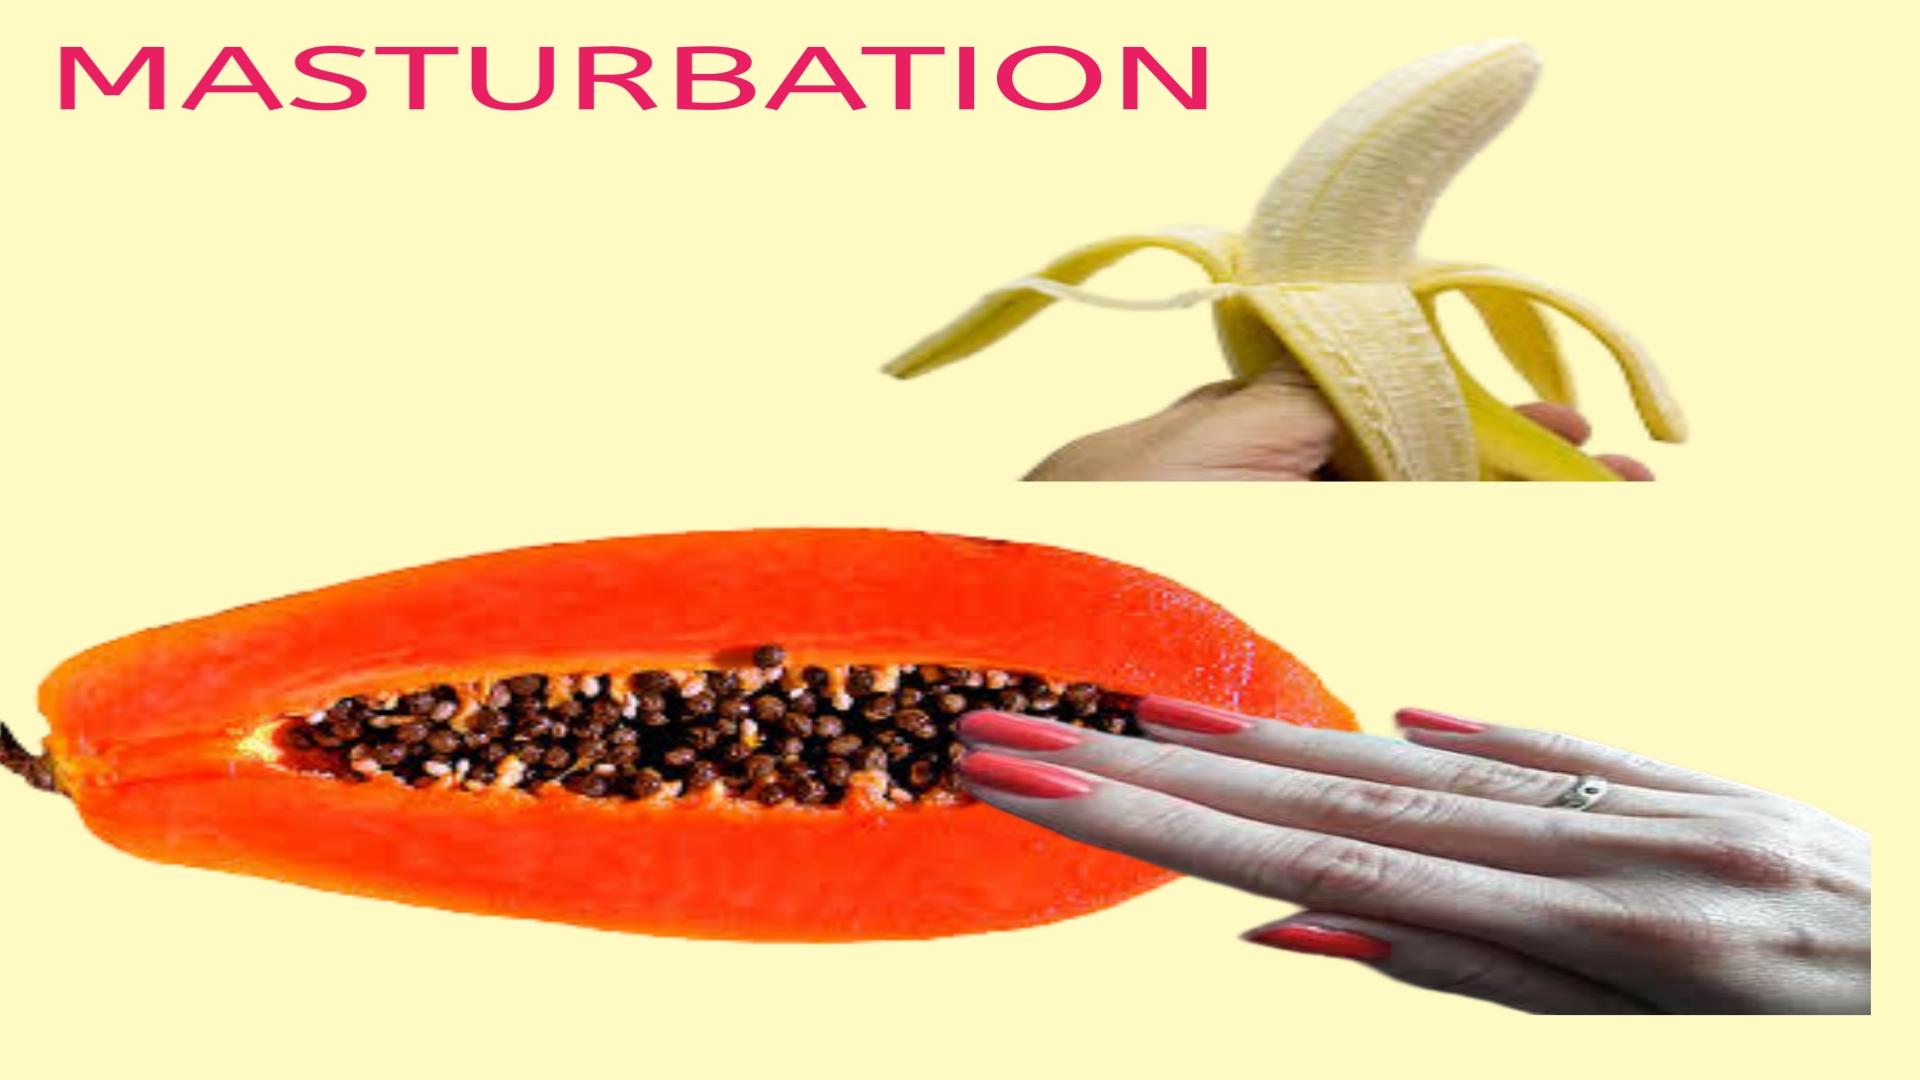 Masturbation side effects and benefits - हस्तमैथुन के दुष्प्रभाव और लाभ